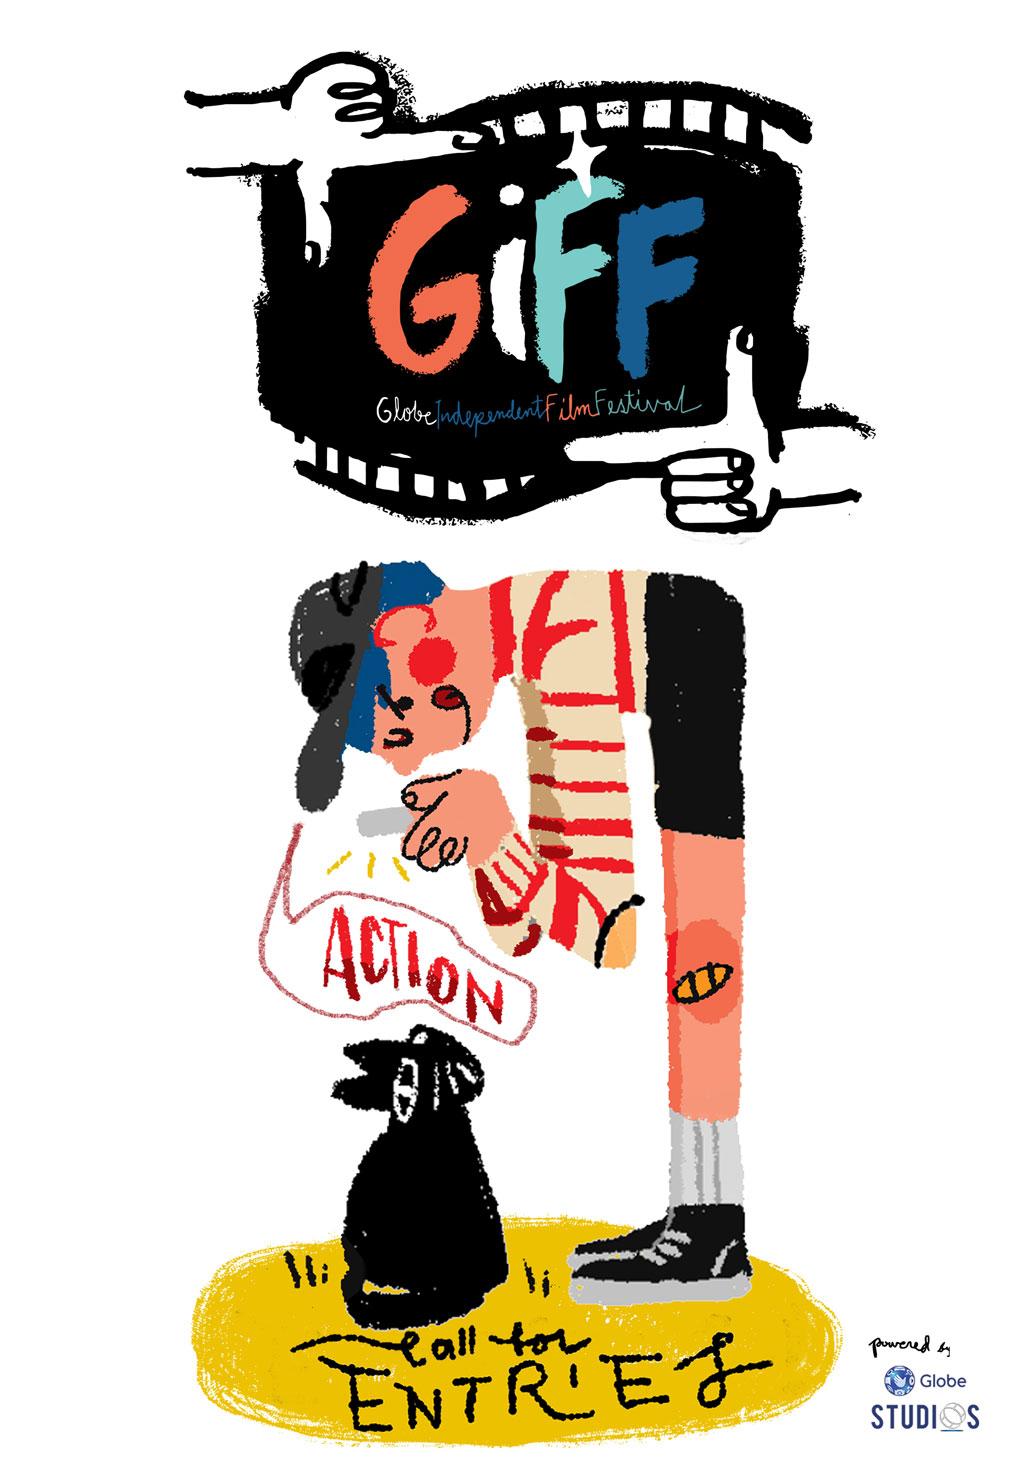 Globe Independent Film Festival Official Logo